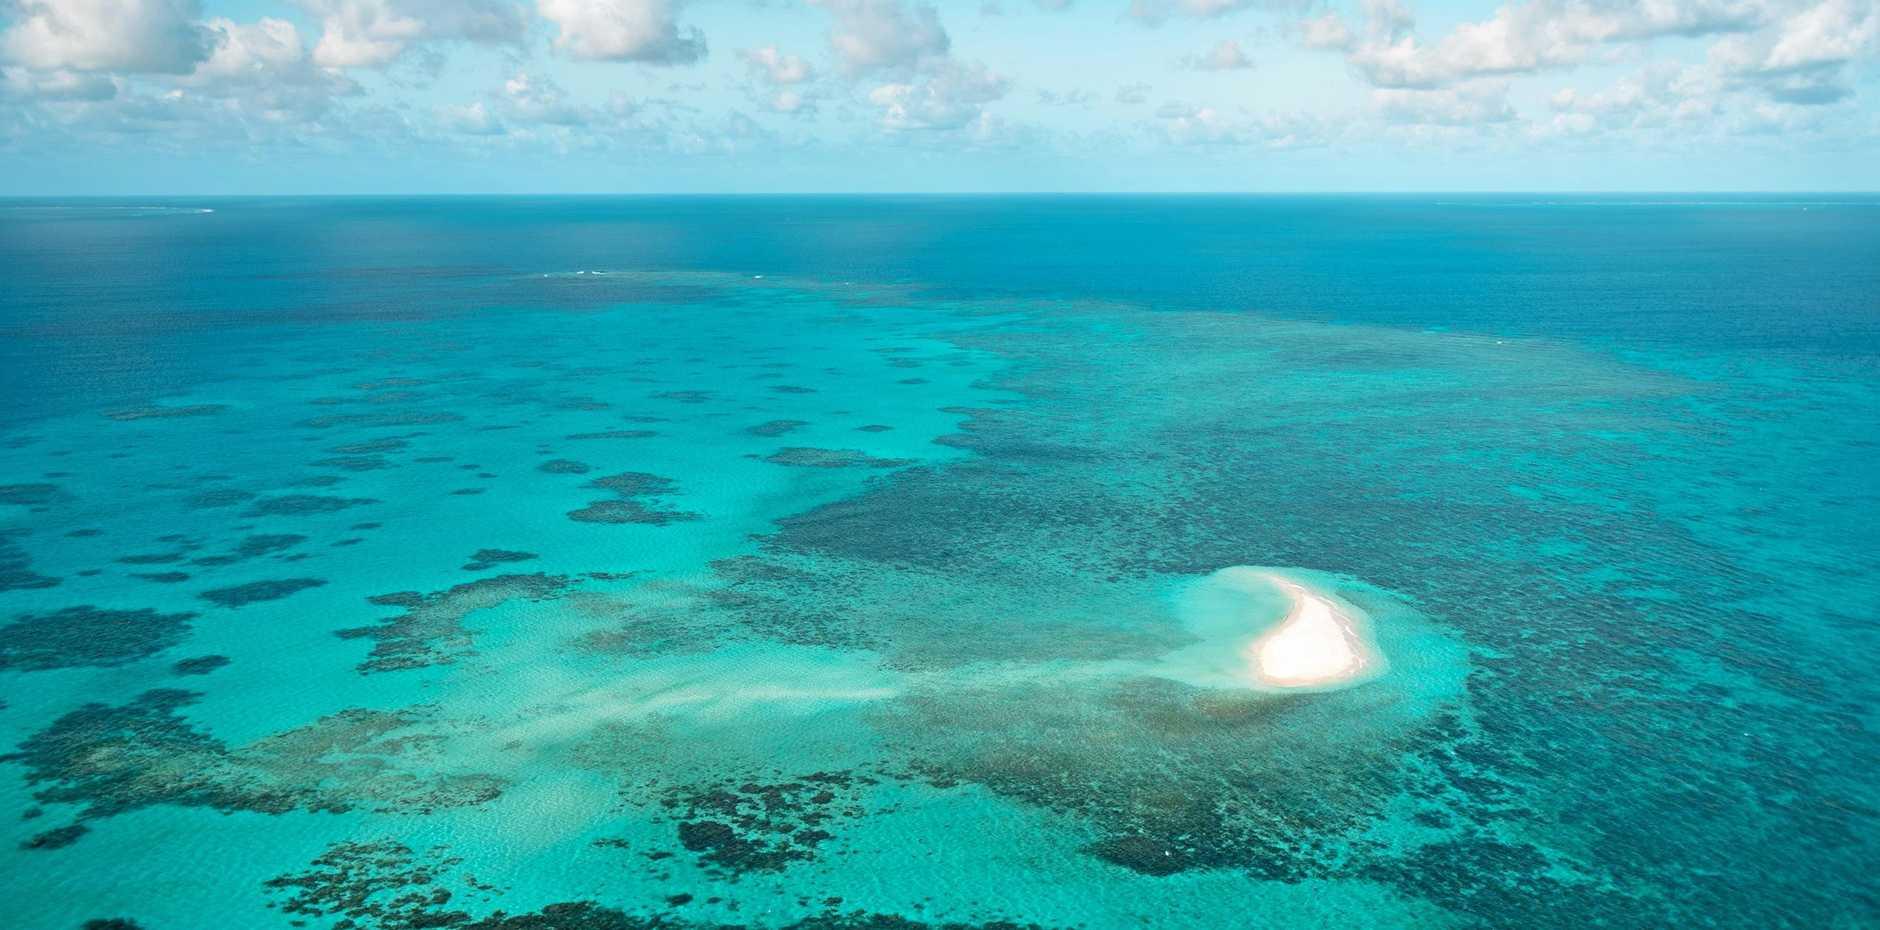 Aerial of Sudbury Cay Great Barrier Reef.